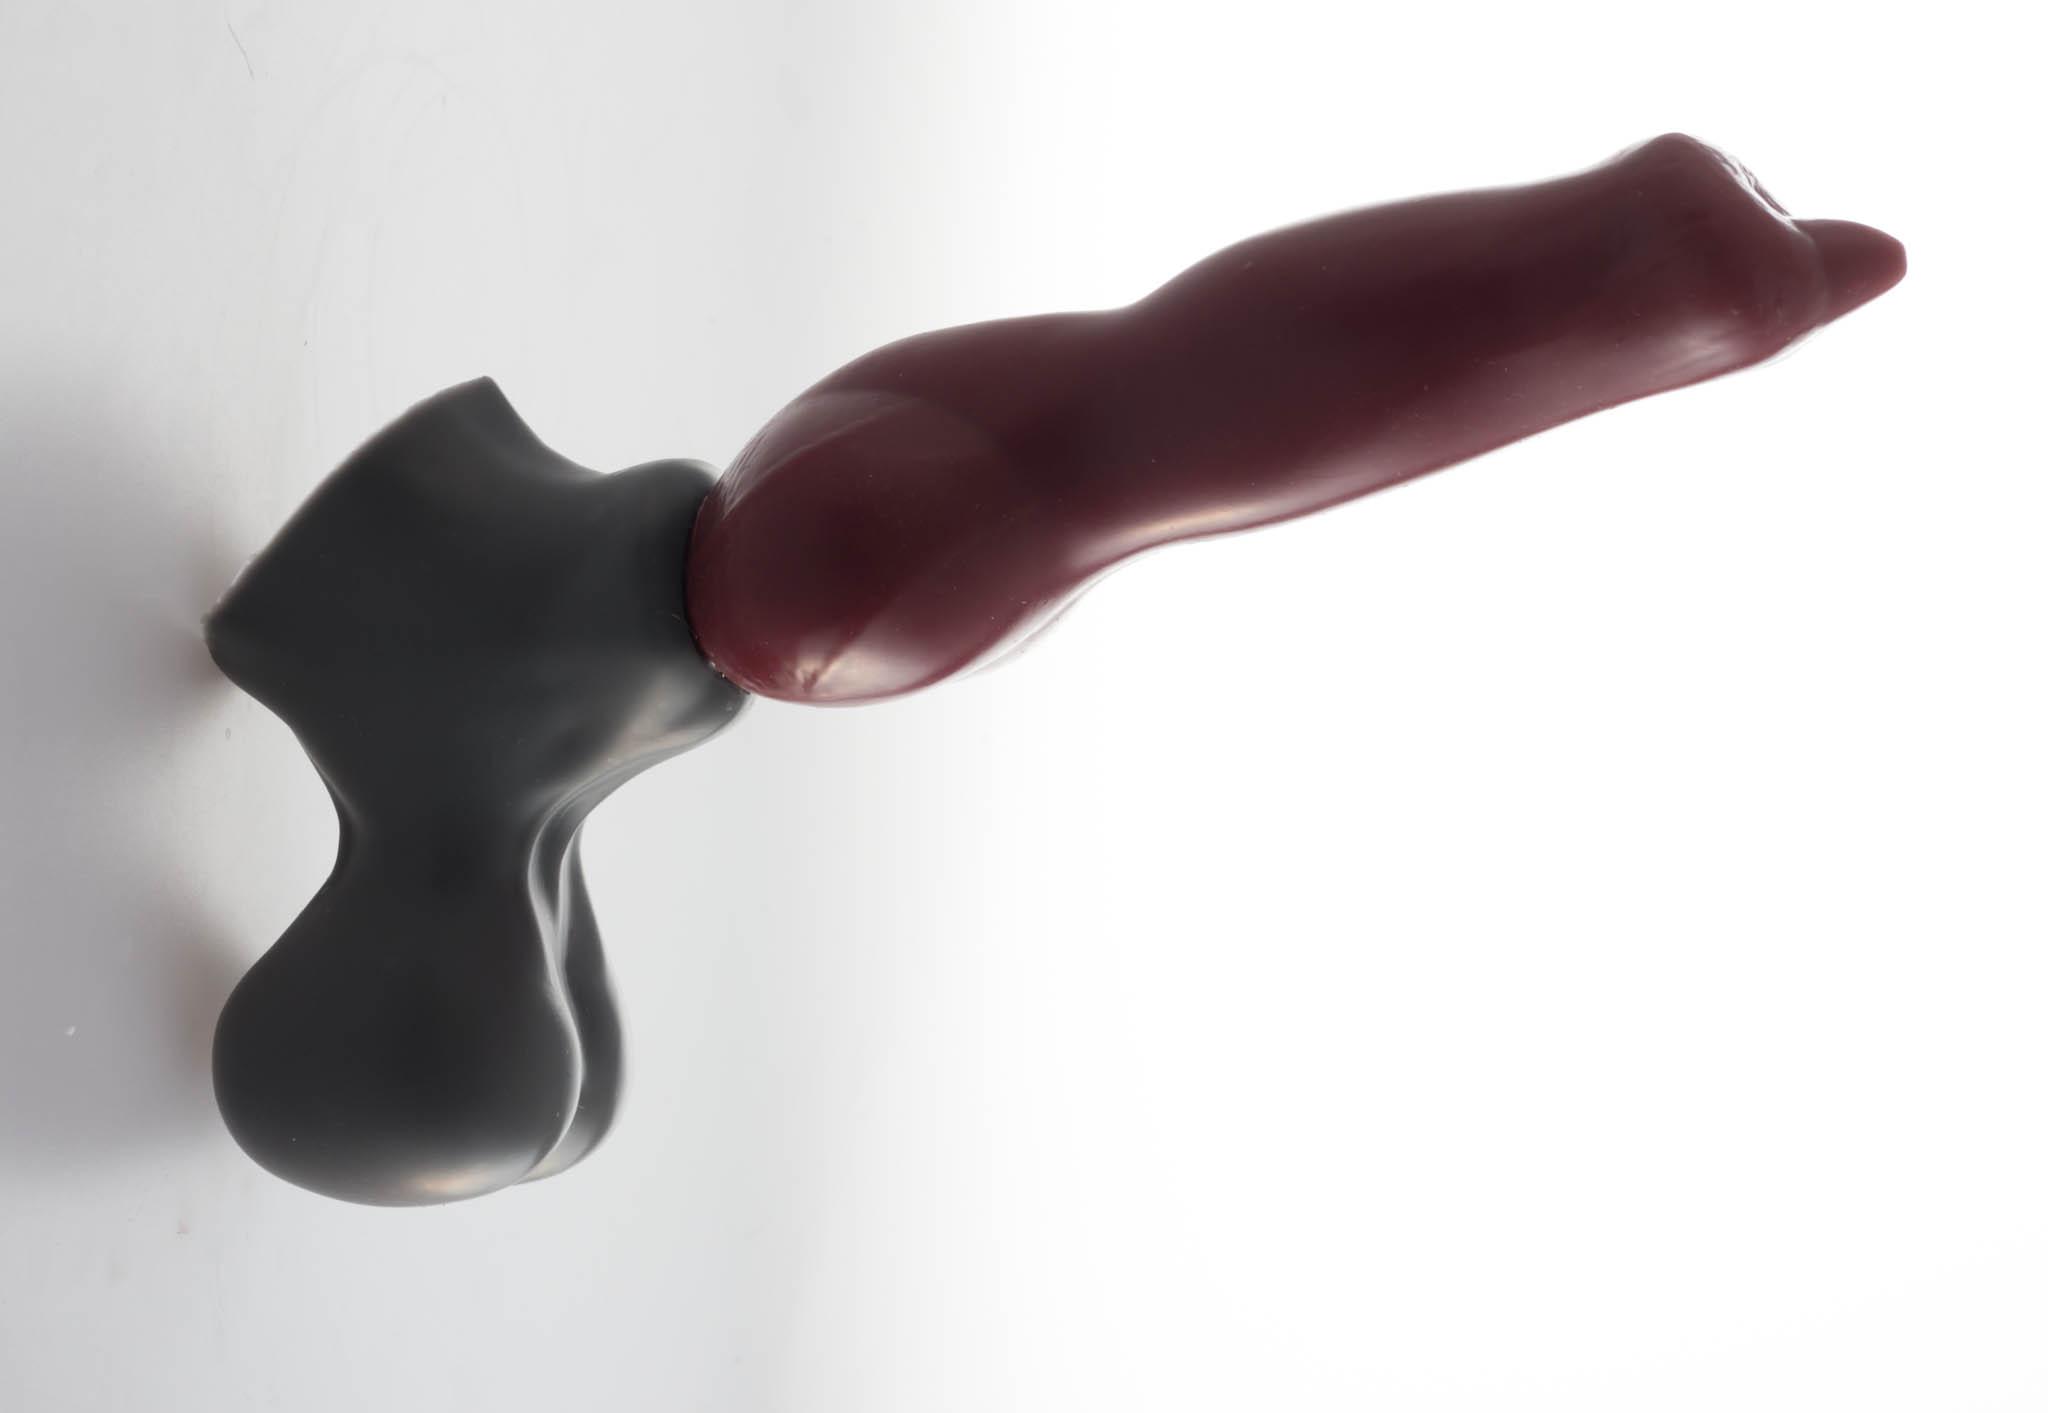 Voyeur nudist porn